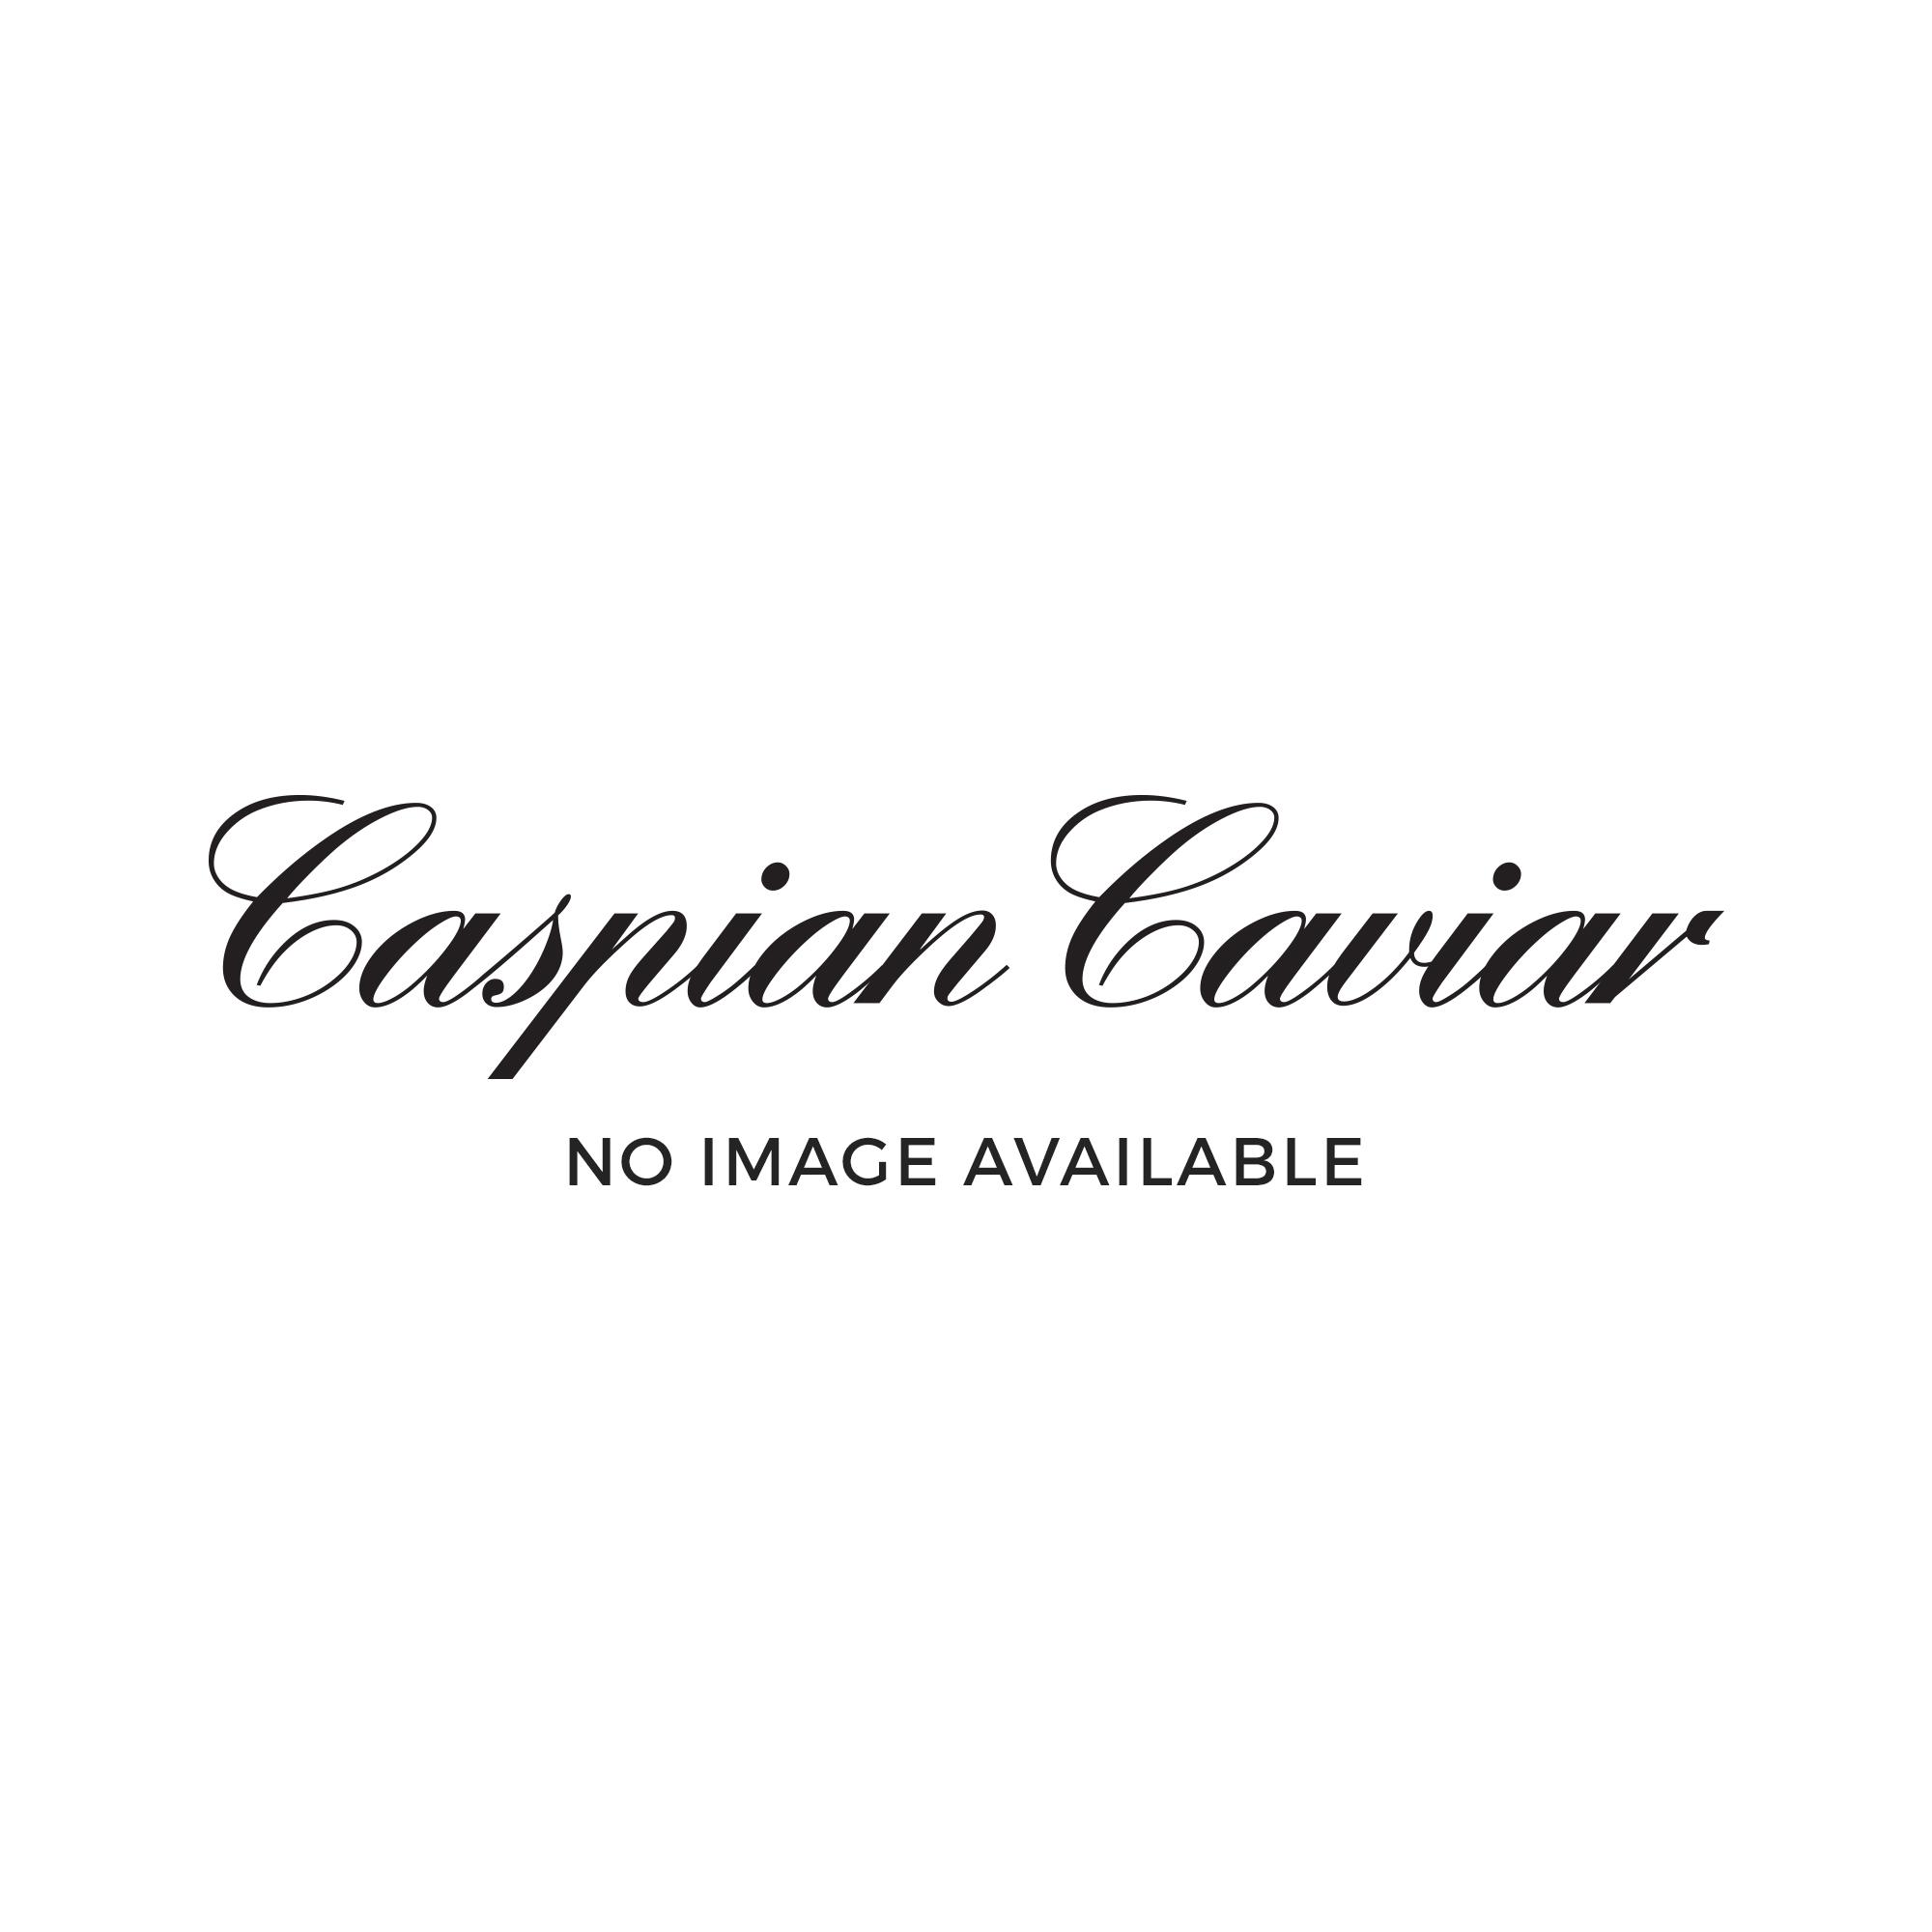 Caspian Caviar Super Hamper